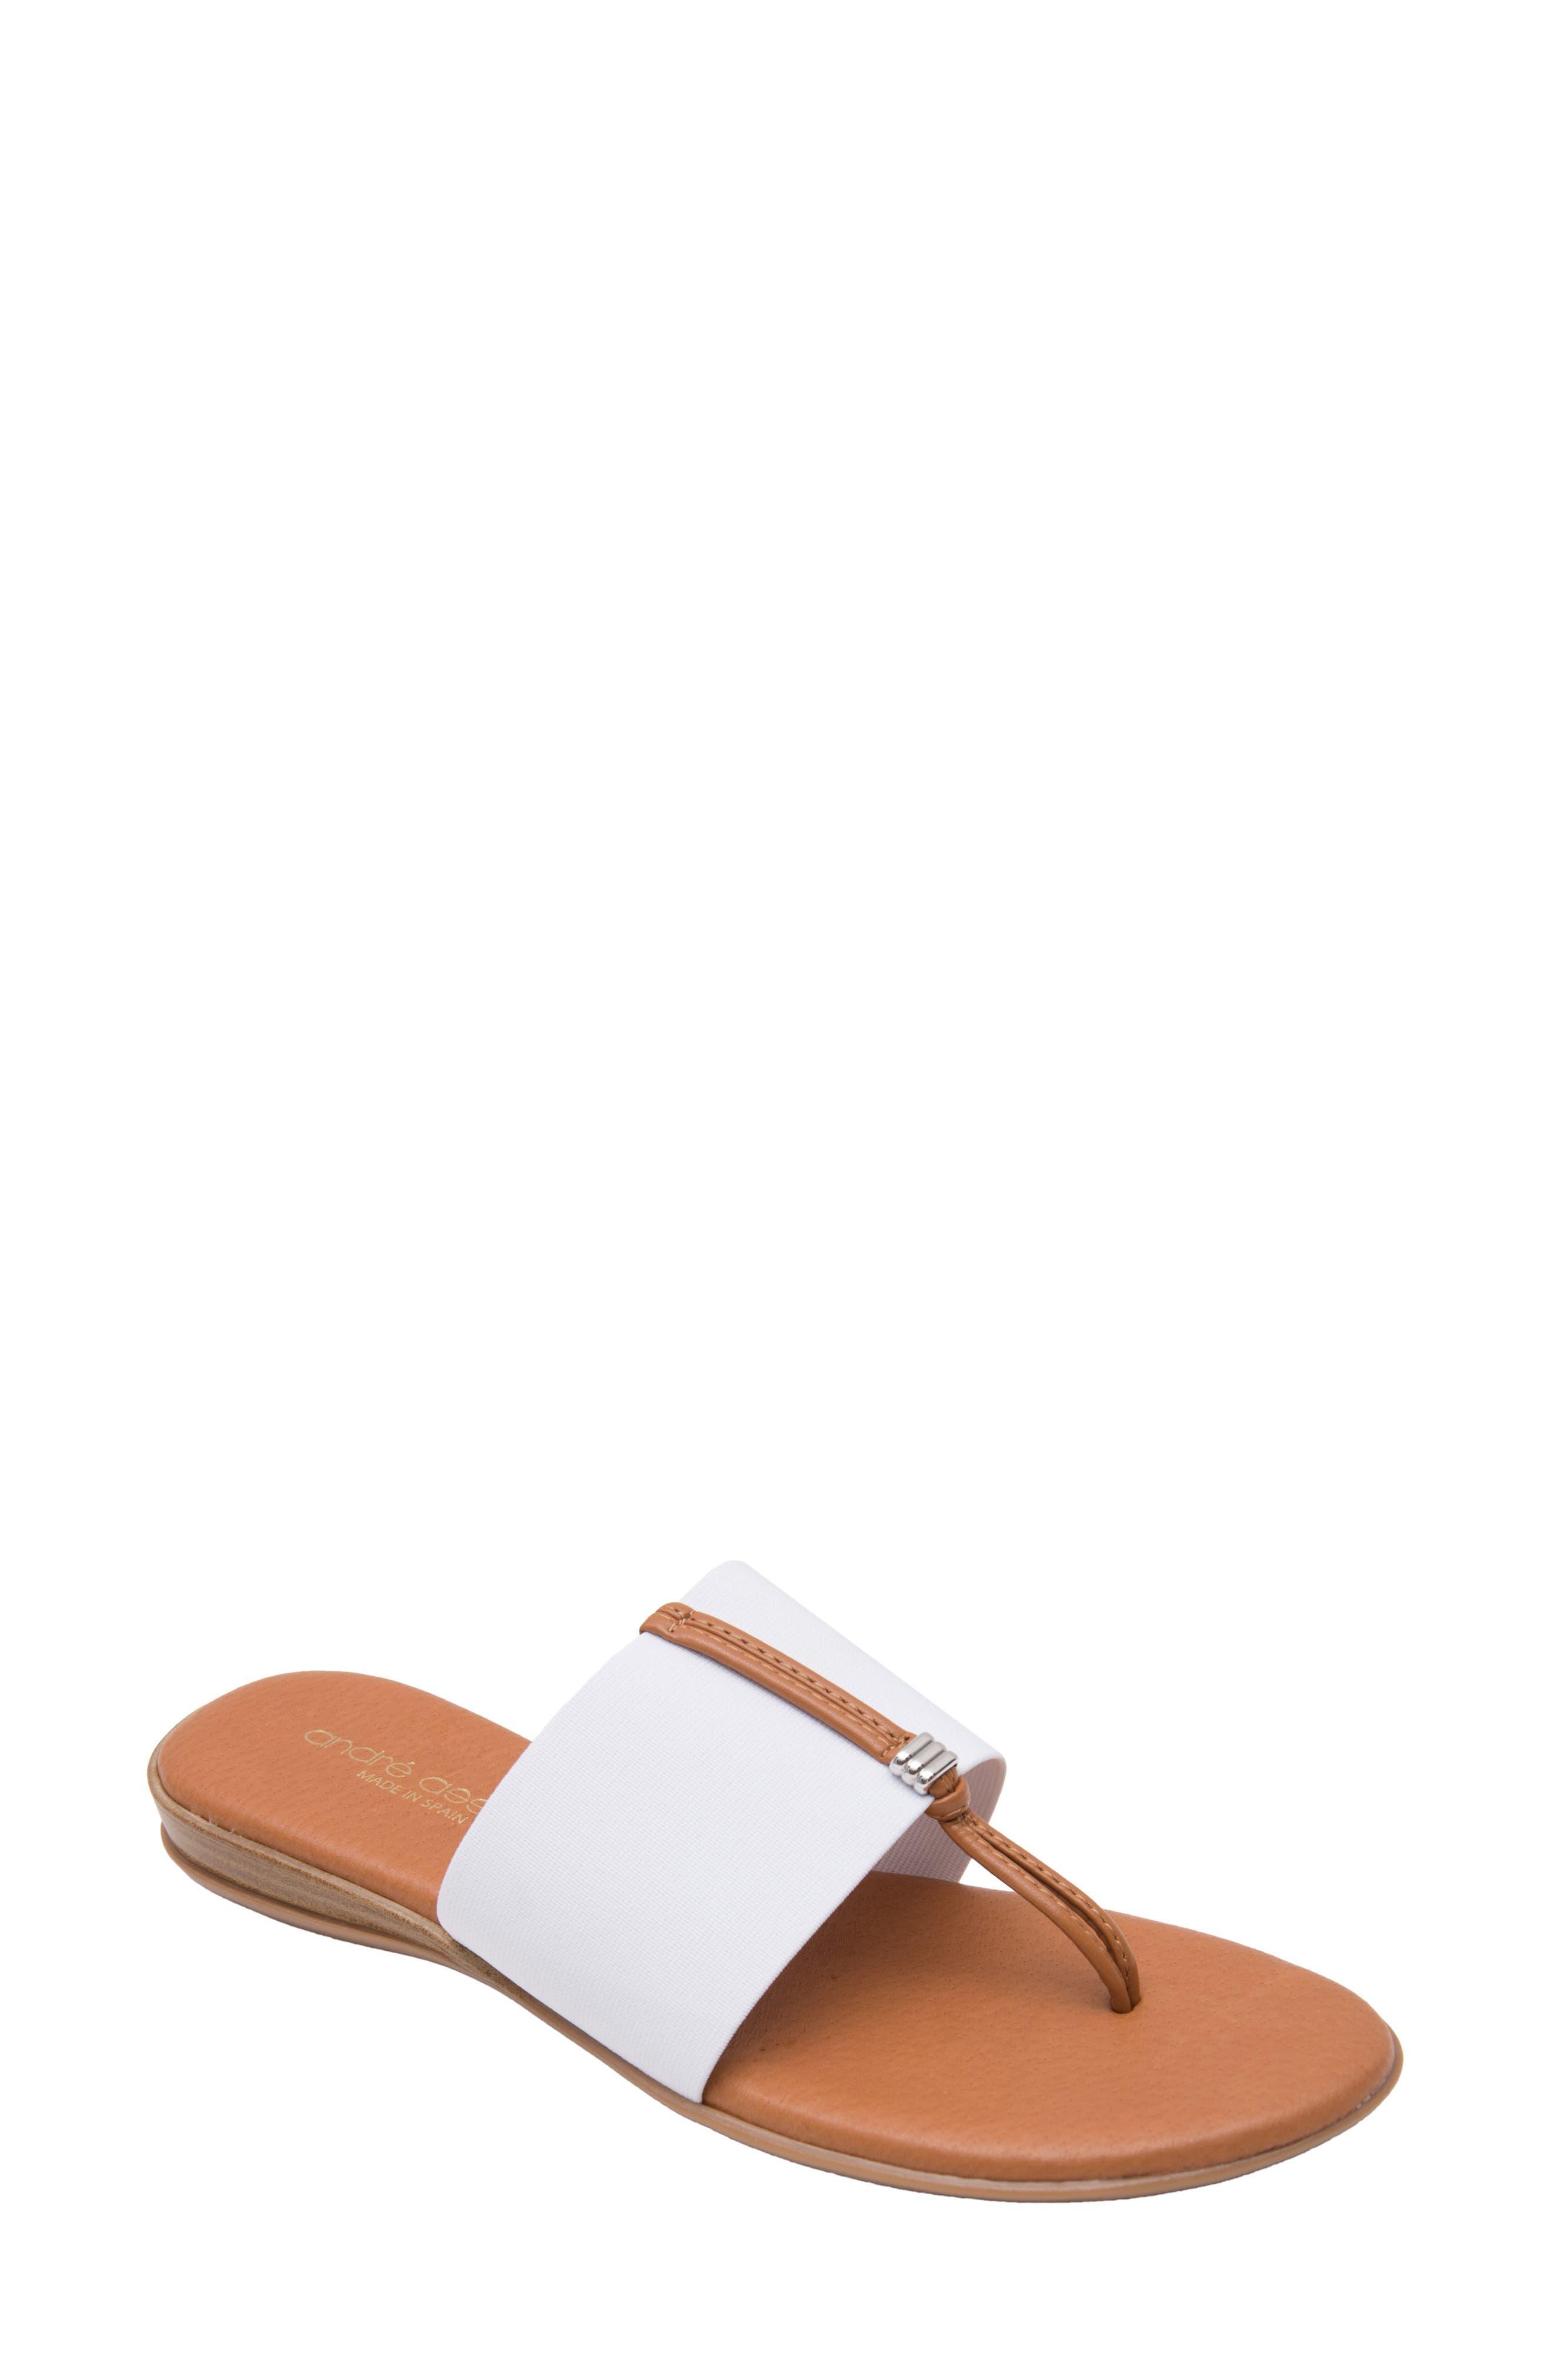 ANDRE ASSOUS Nice Sandal in White